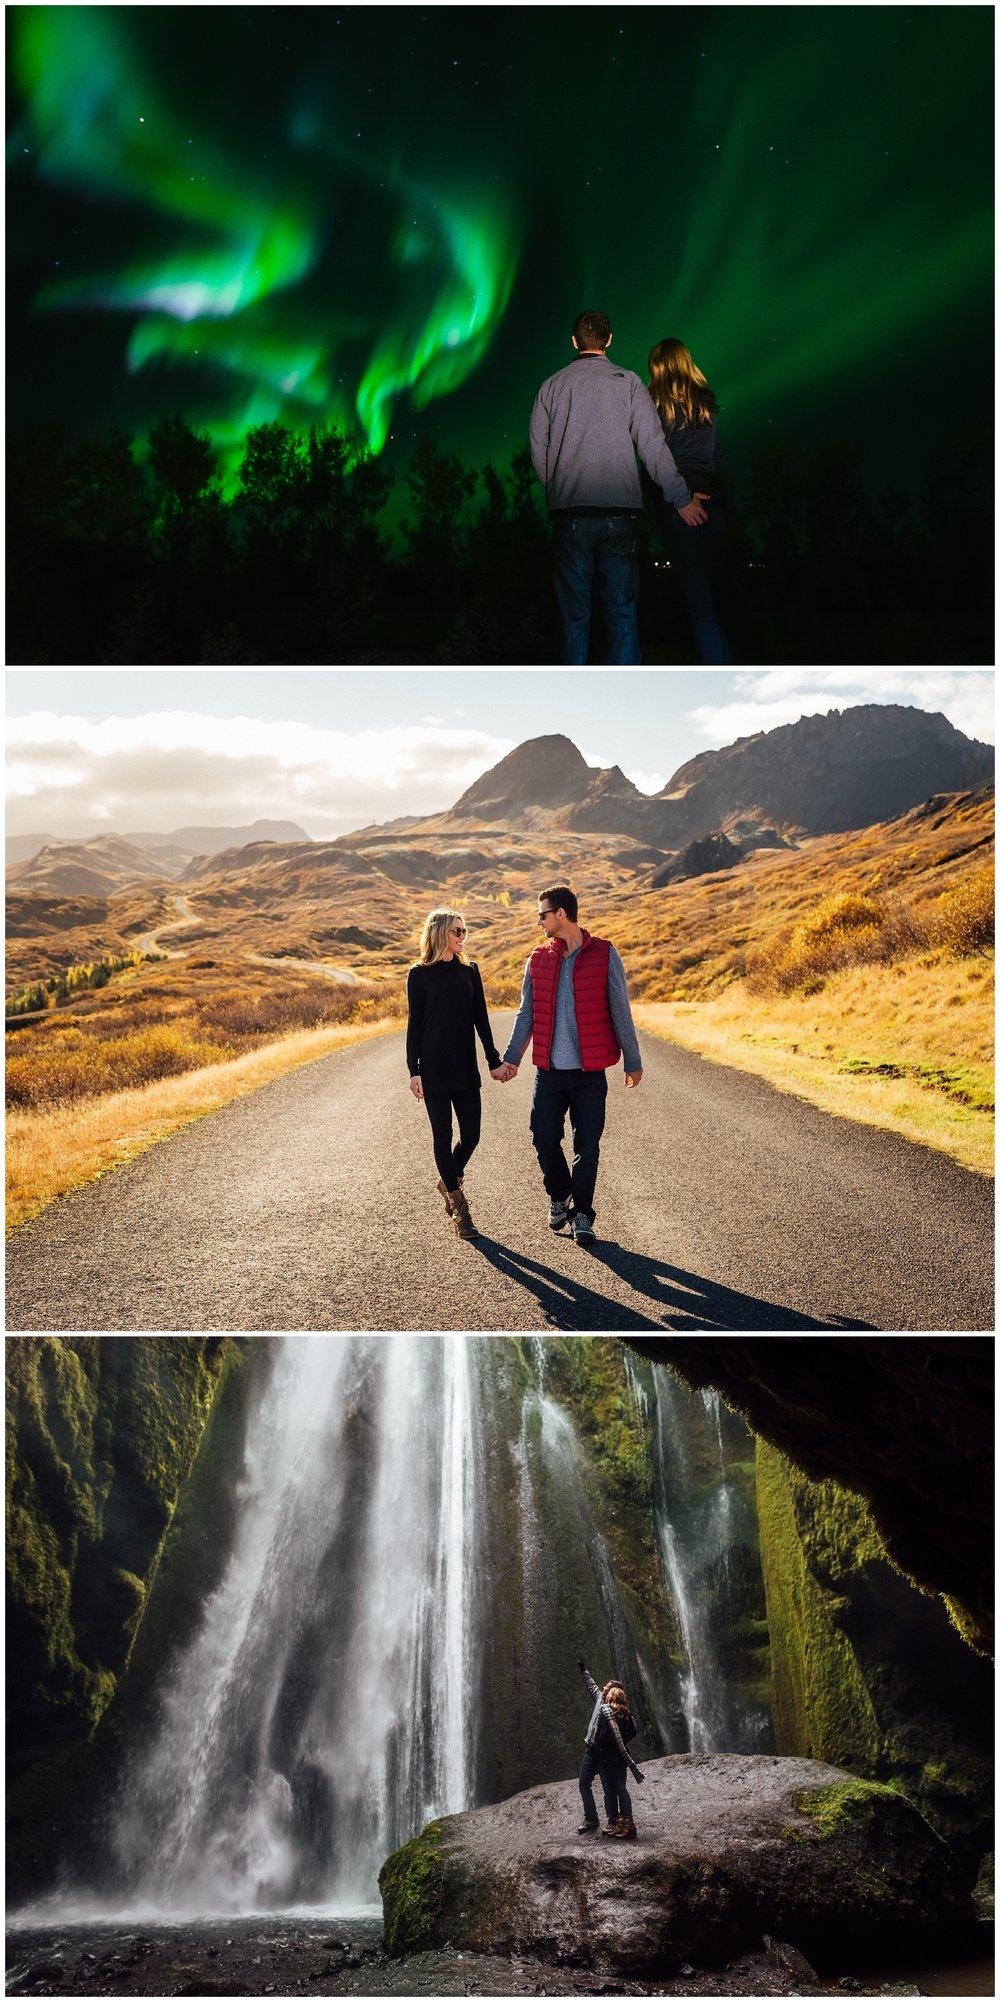 Ashlee-hamon-photography-year-in-review-2016-travel-wanderlust-vsco-adventure-wedding_0060.jpg